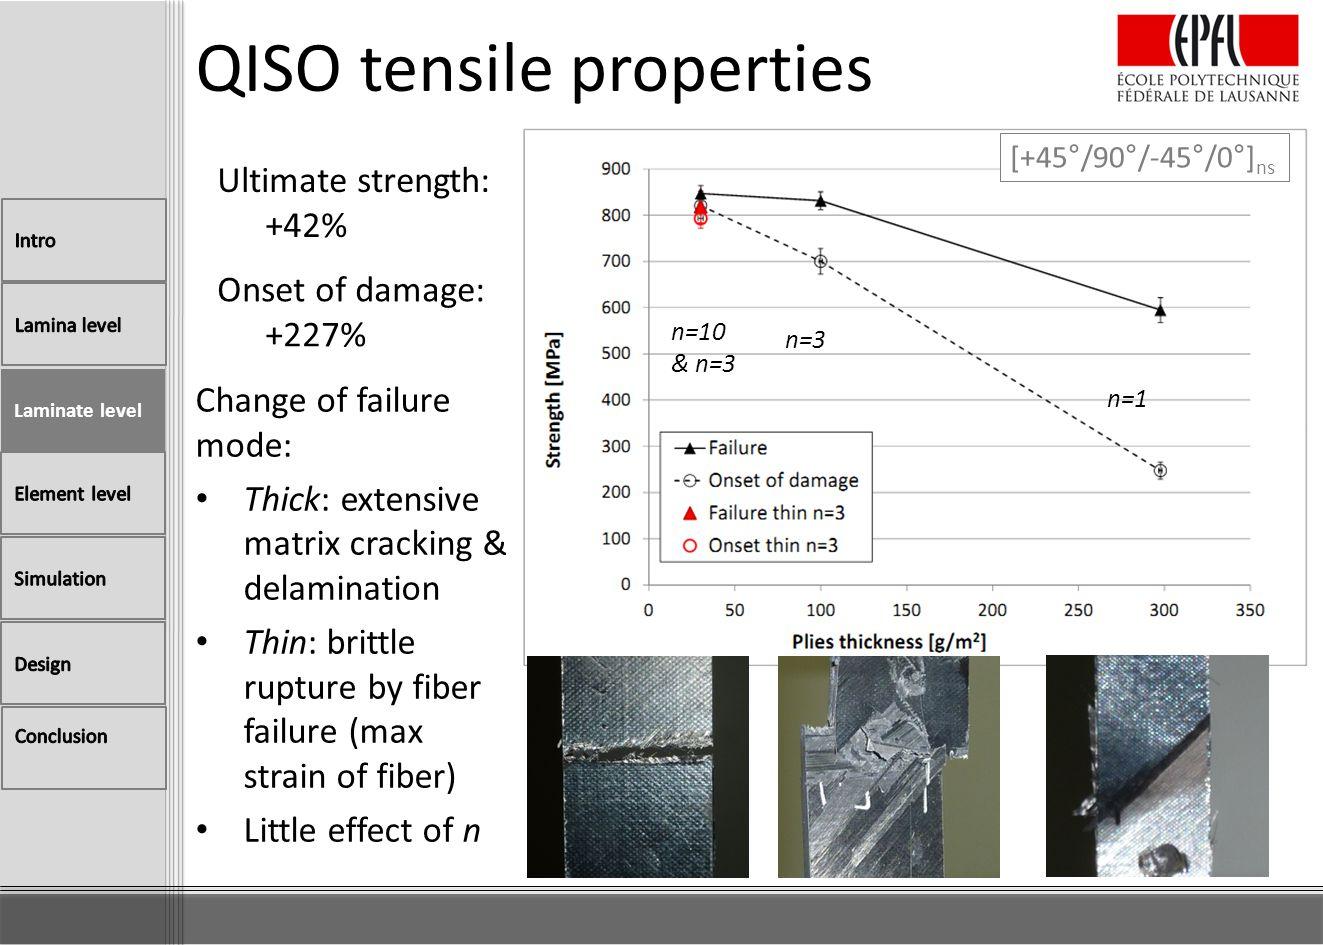 QISO tensile properties